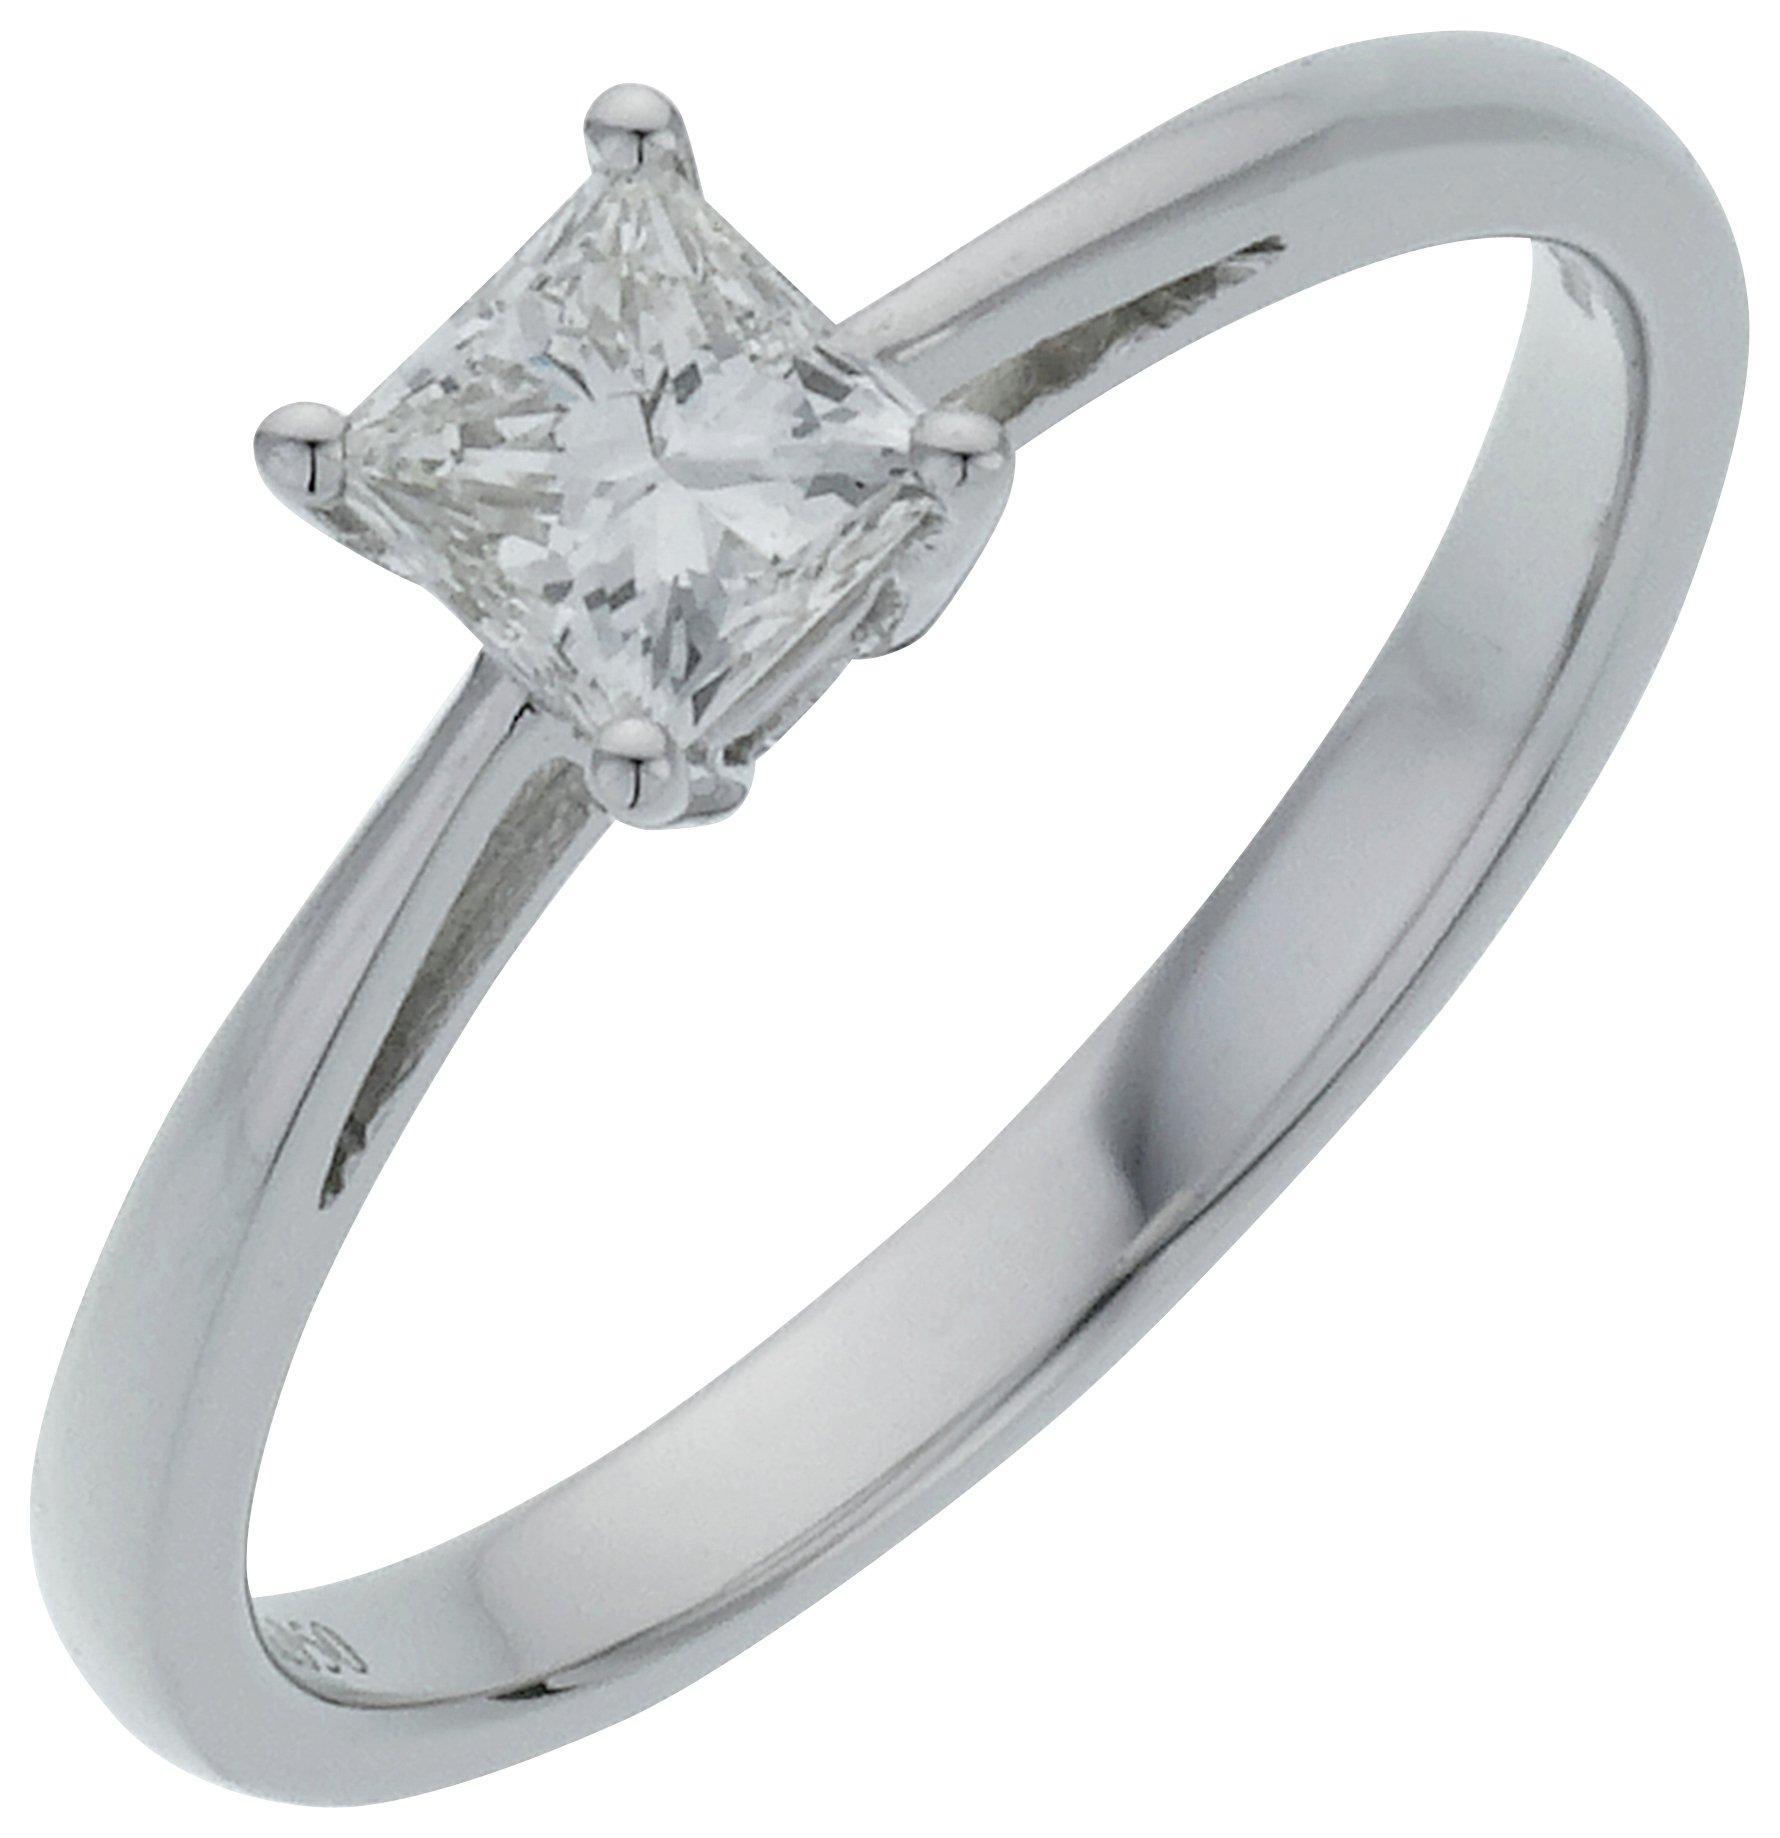 18 Carat White Gold 05 Carat Diamond - Princess Cut Diamond - Ring - S